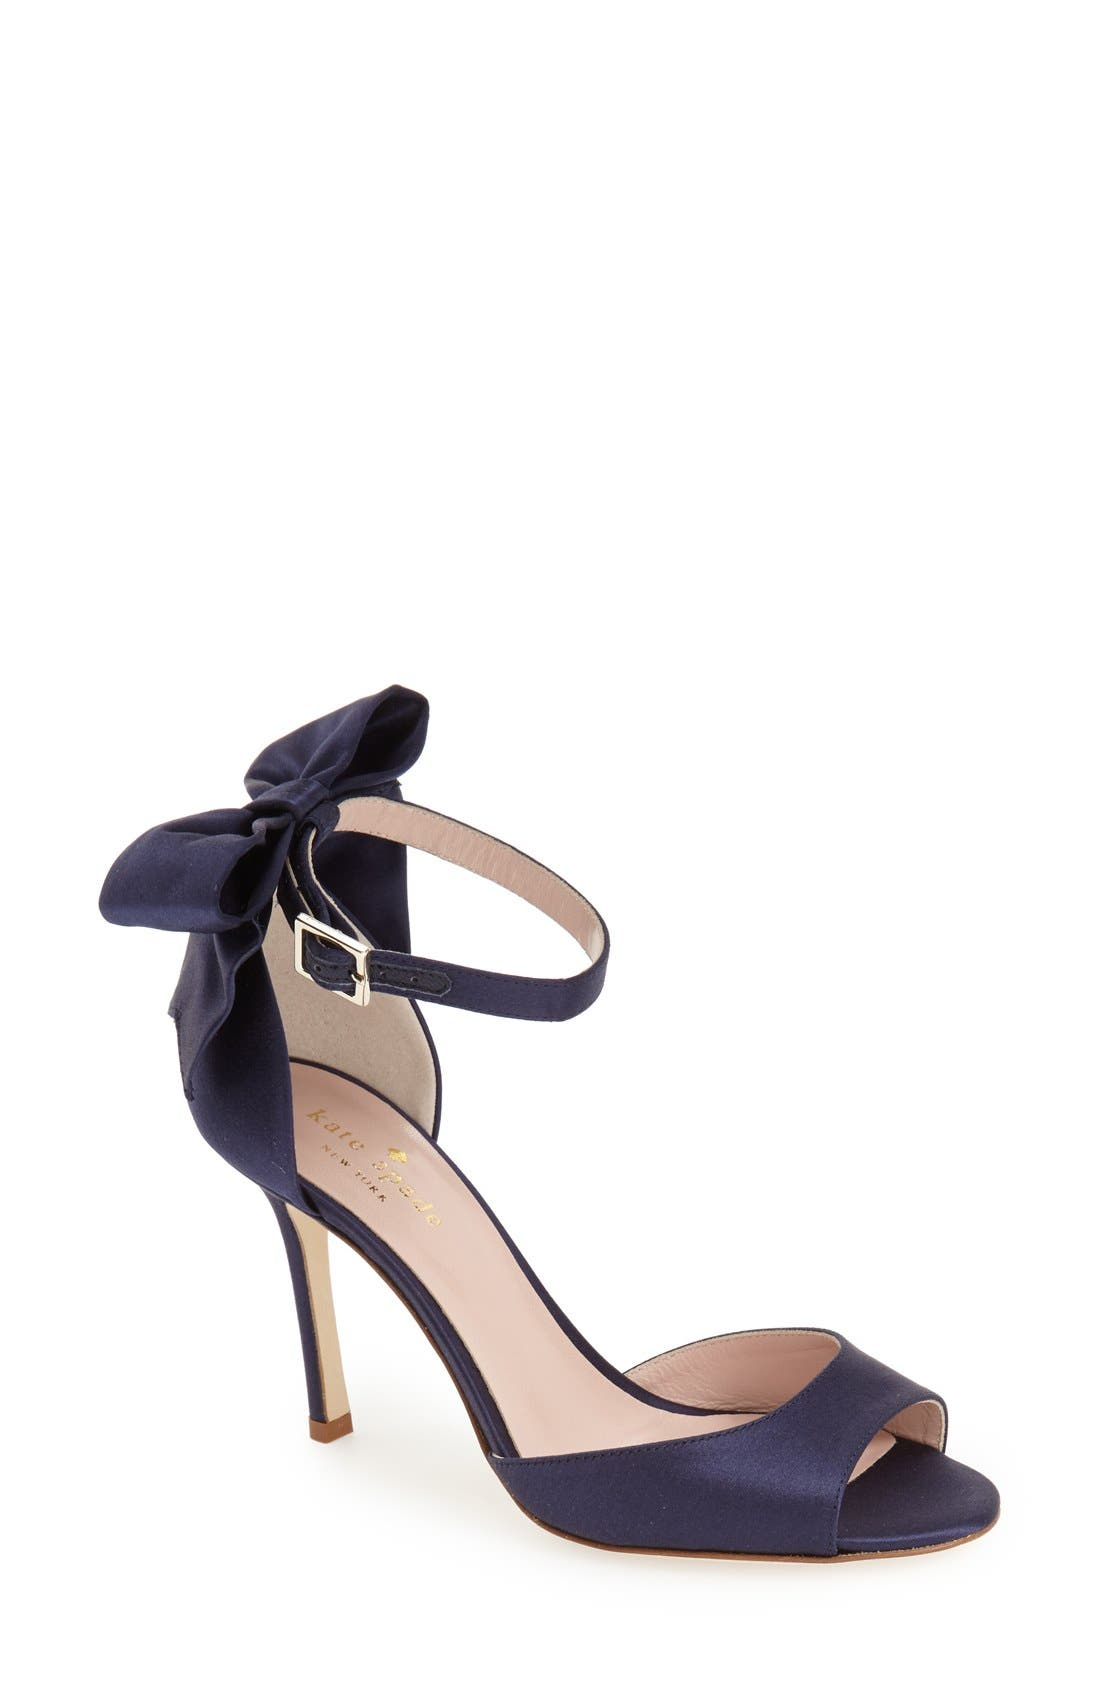 Alternate Image 1 Selected - kate spade new york 'izzie' sandal (Women)